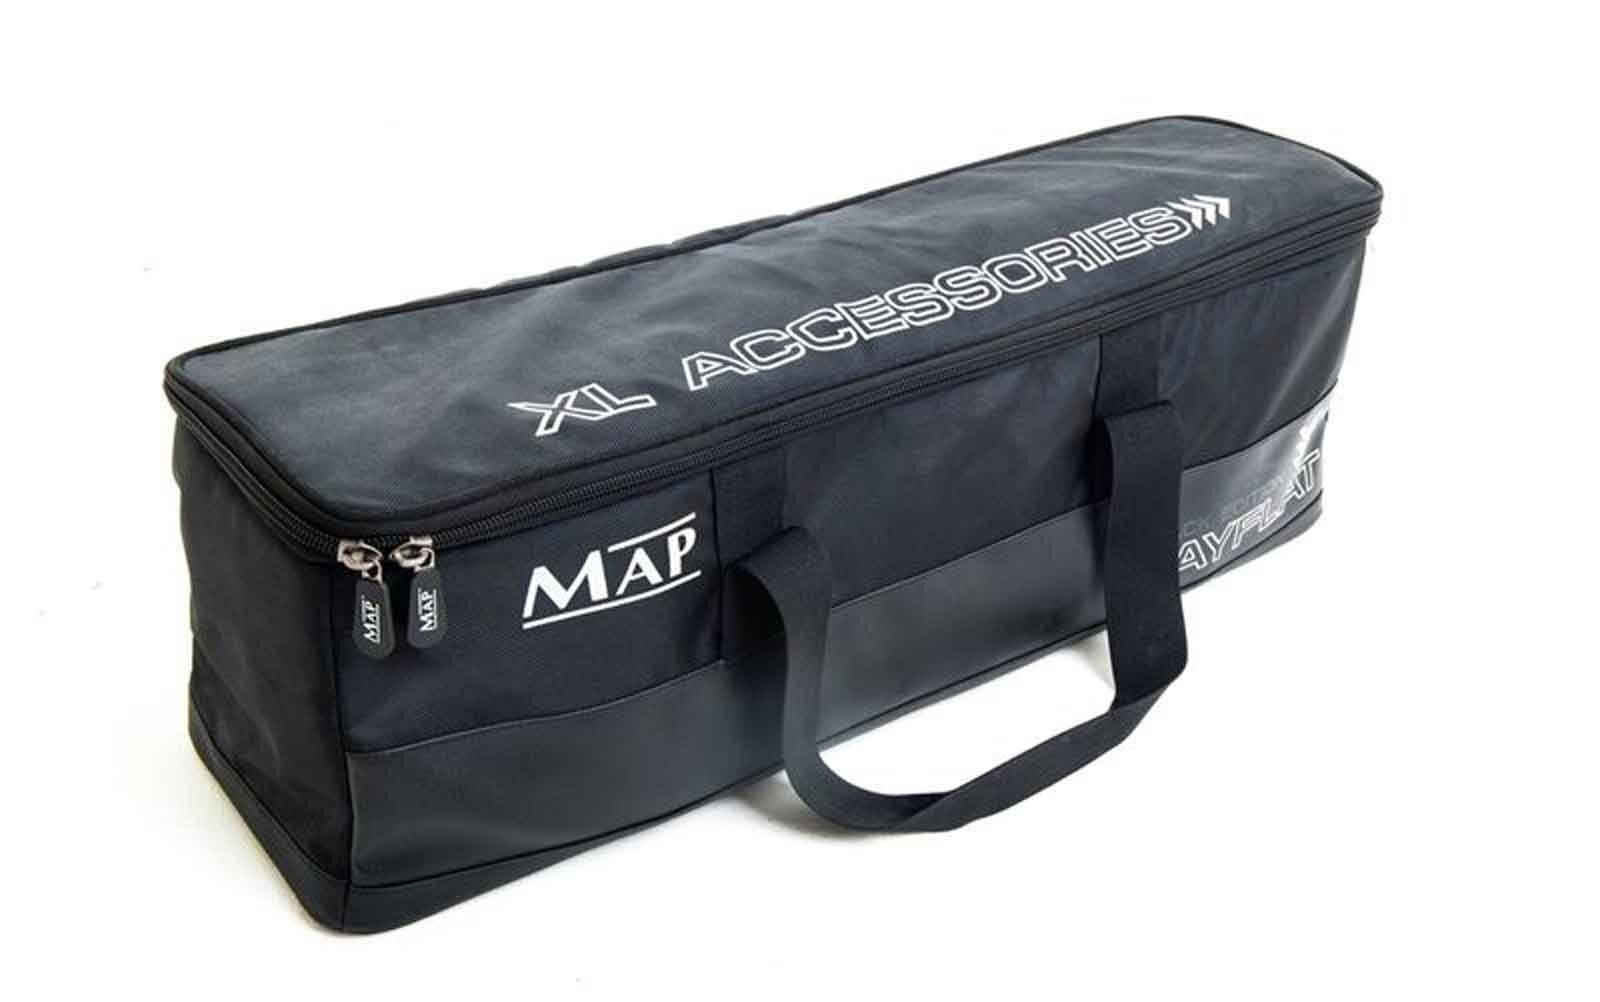 Map Parabolix Layflat Carryall Black Edition *NEW*  Coarse Match Fishin *H0922*